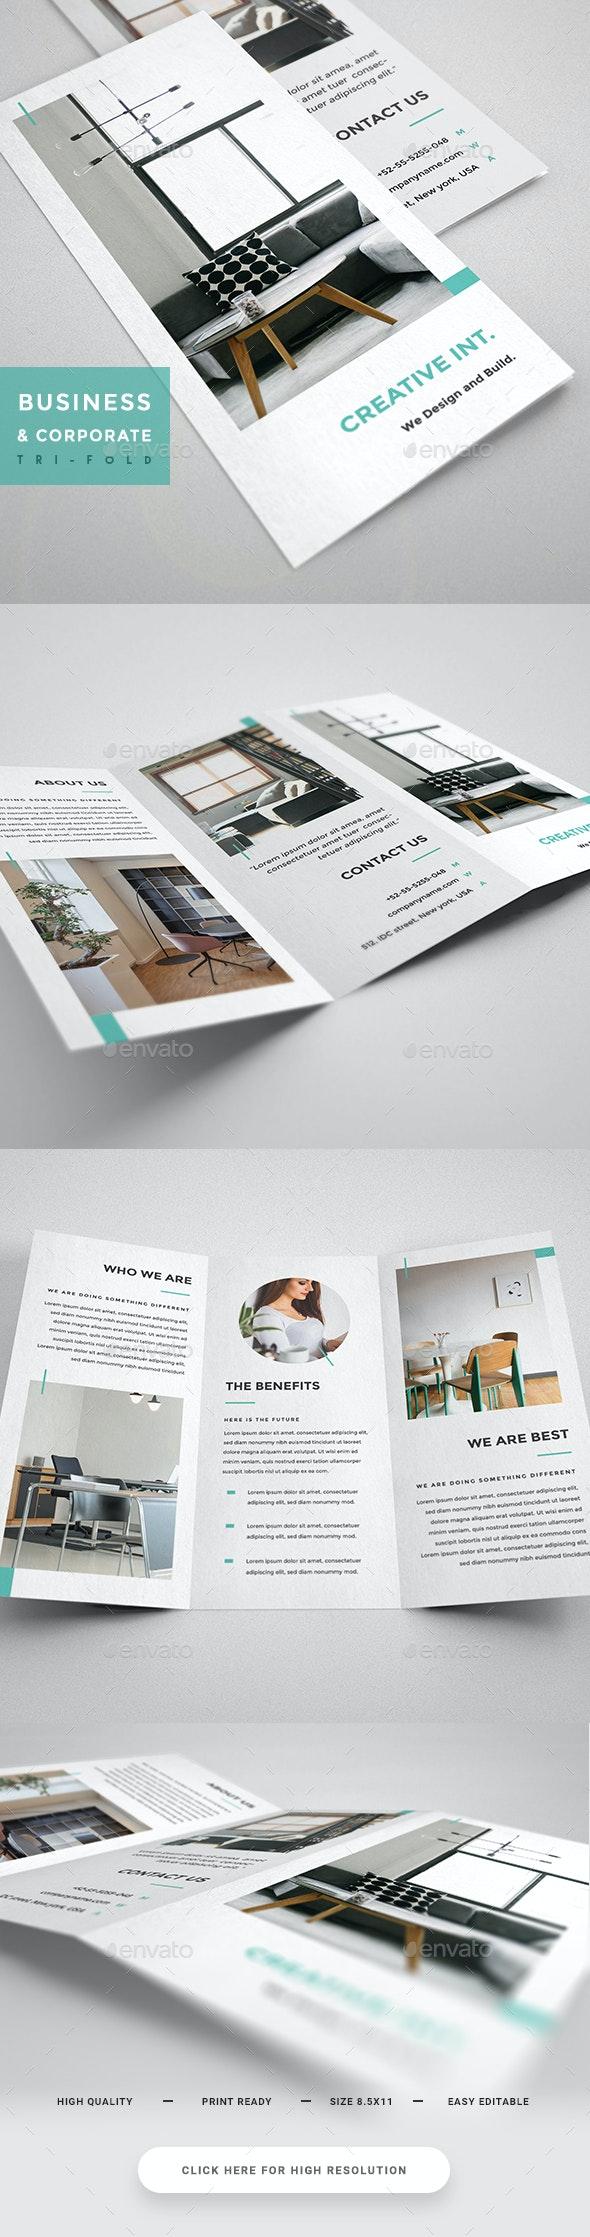 Interior Design Tri-Fold - Brochure - Brochures Print Templates